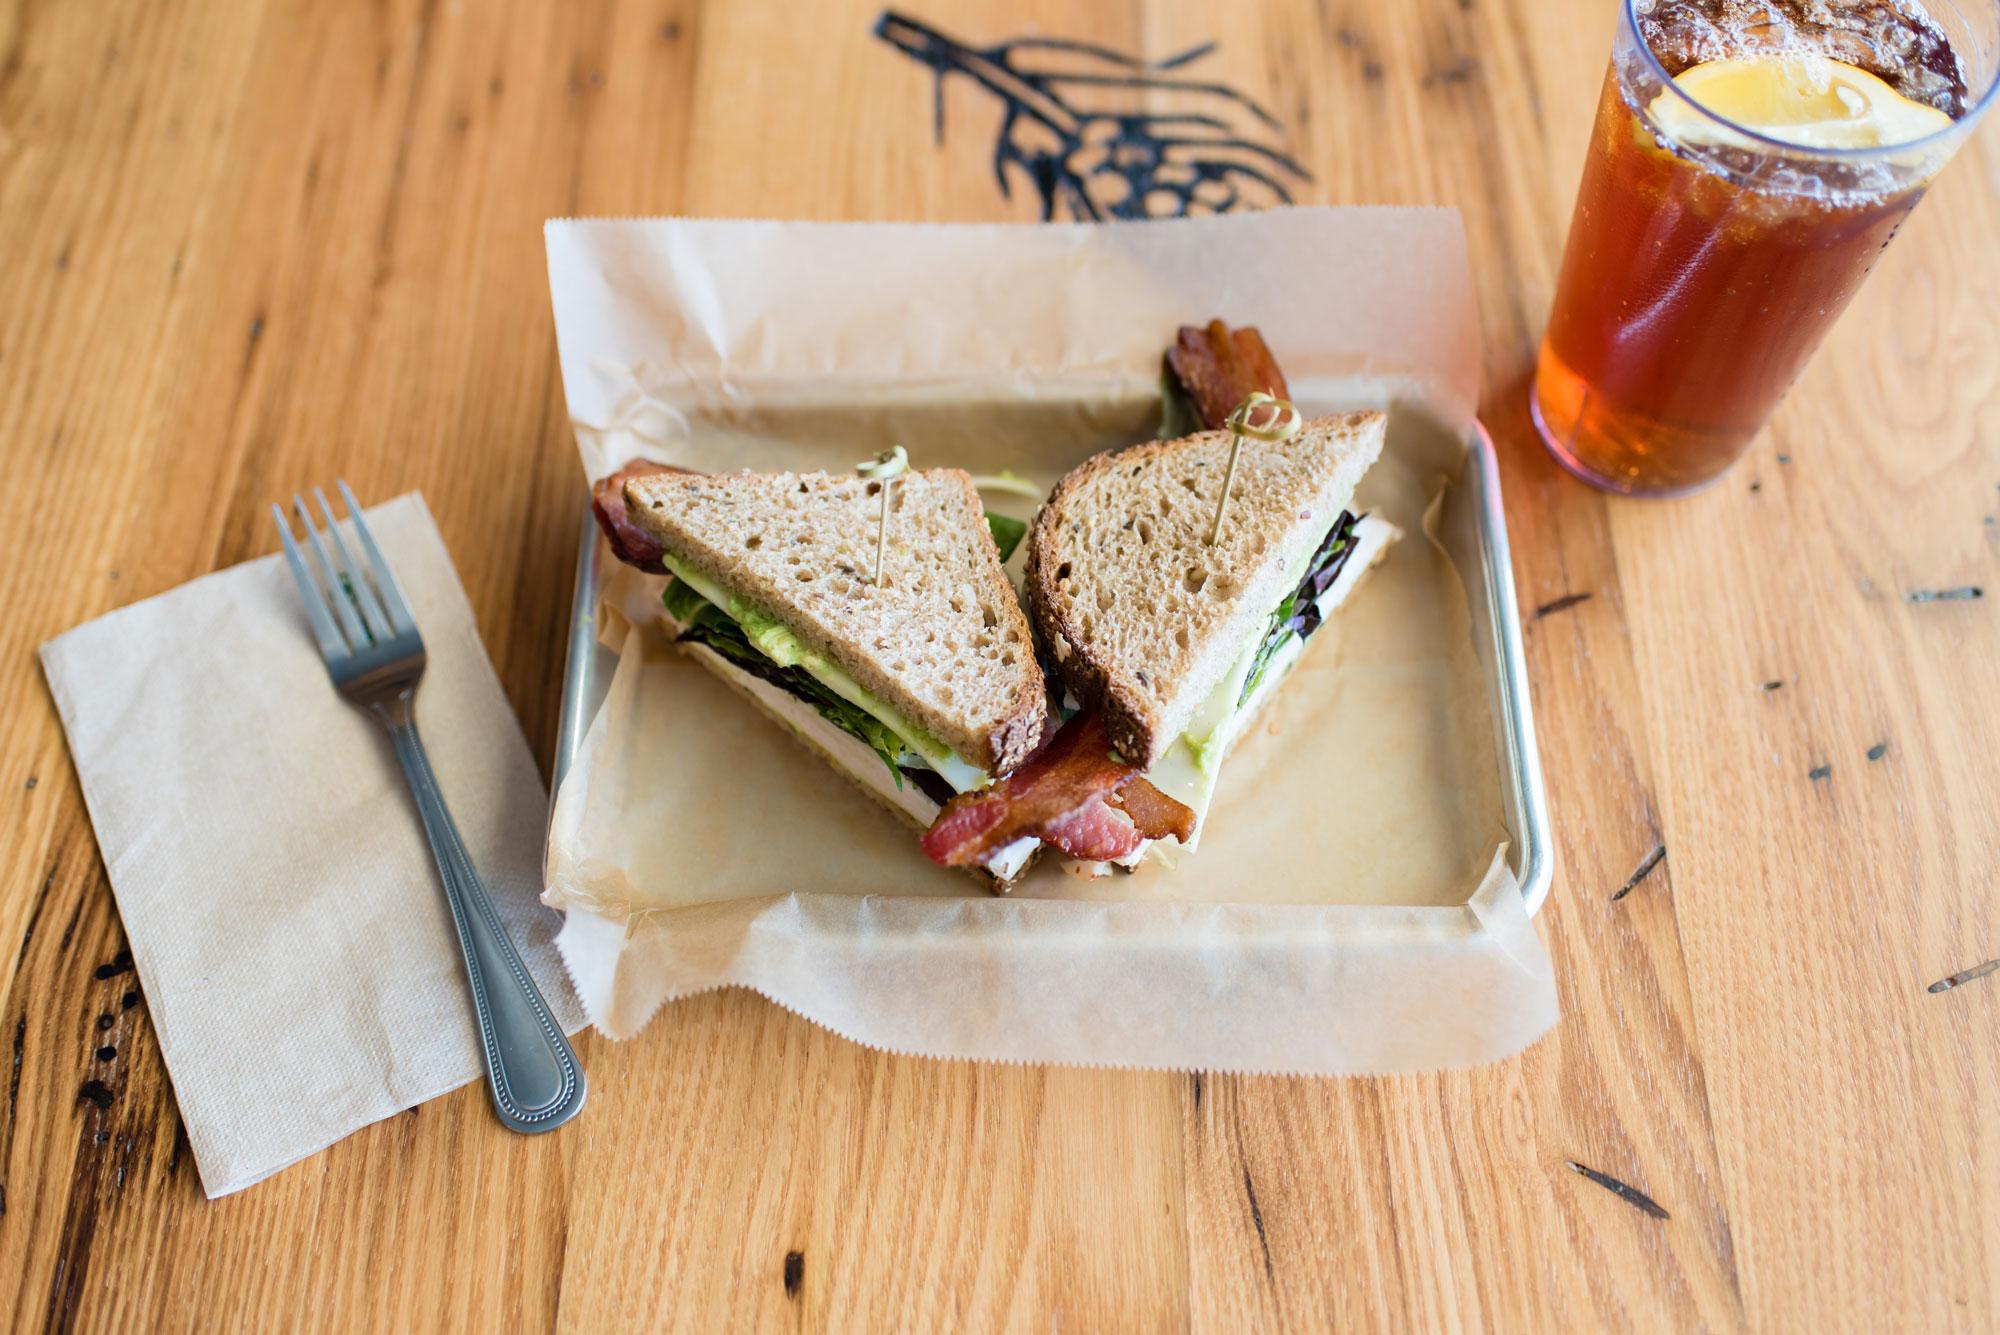 Turkey Avocado and Bacon Sandwich